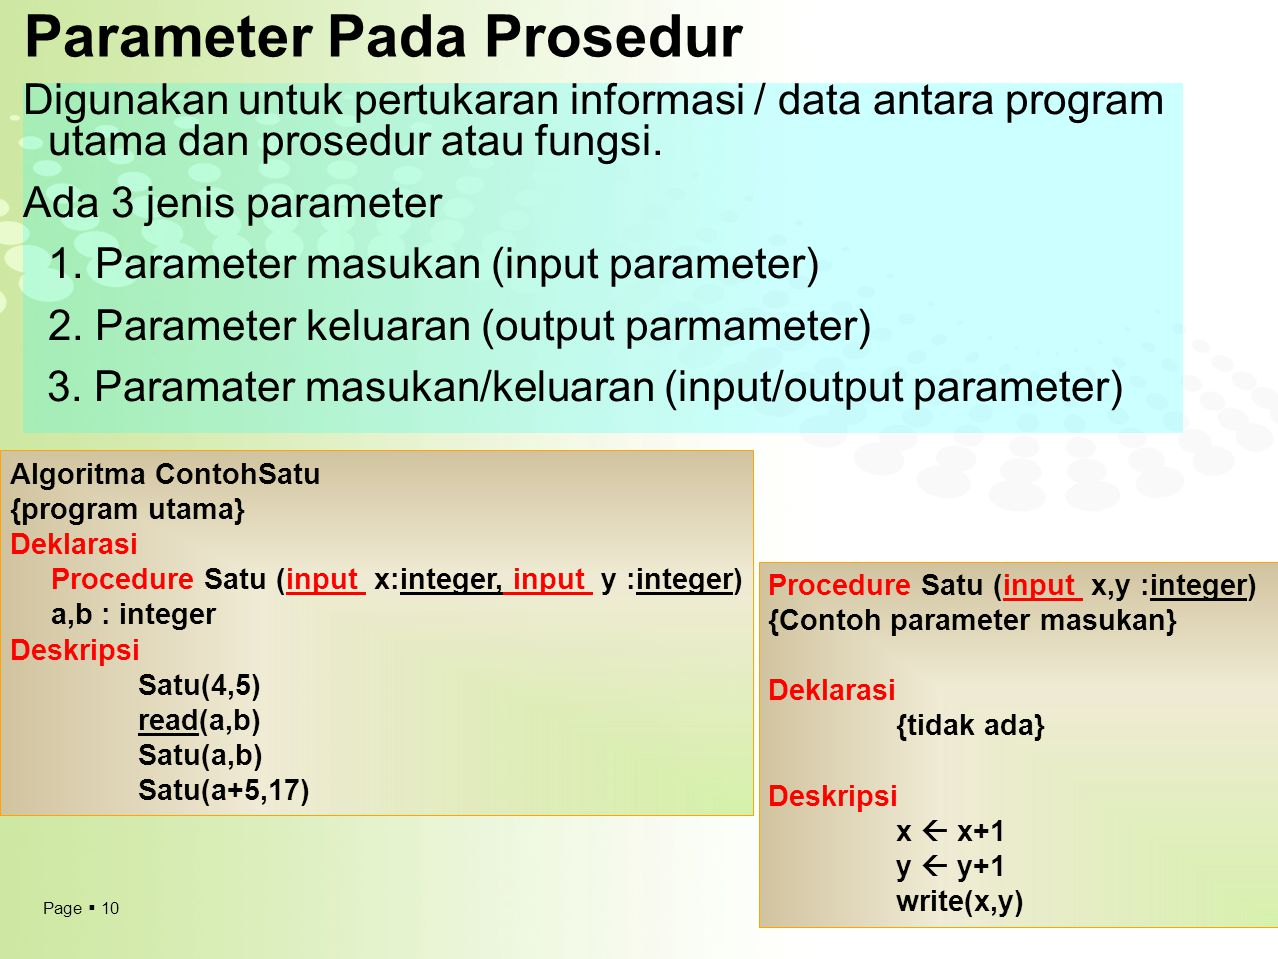 Page  10 Parameter Pada Prosedur Digunakan untuk pertukaran informasi / data antara program utama dan prosedur atau fungsi. Ada 3 jenis parameter 1.